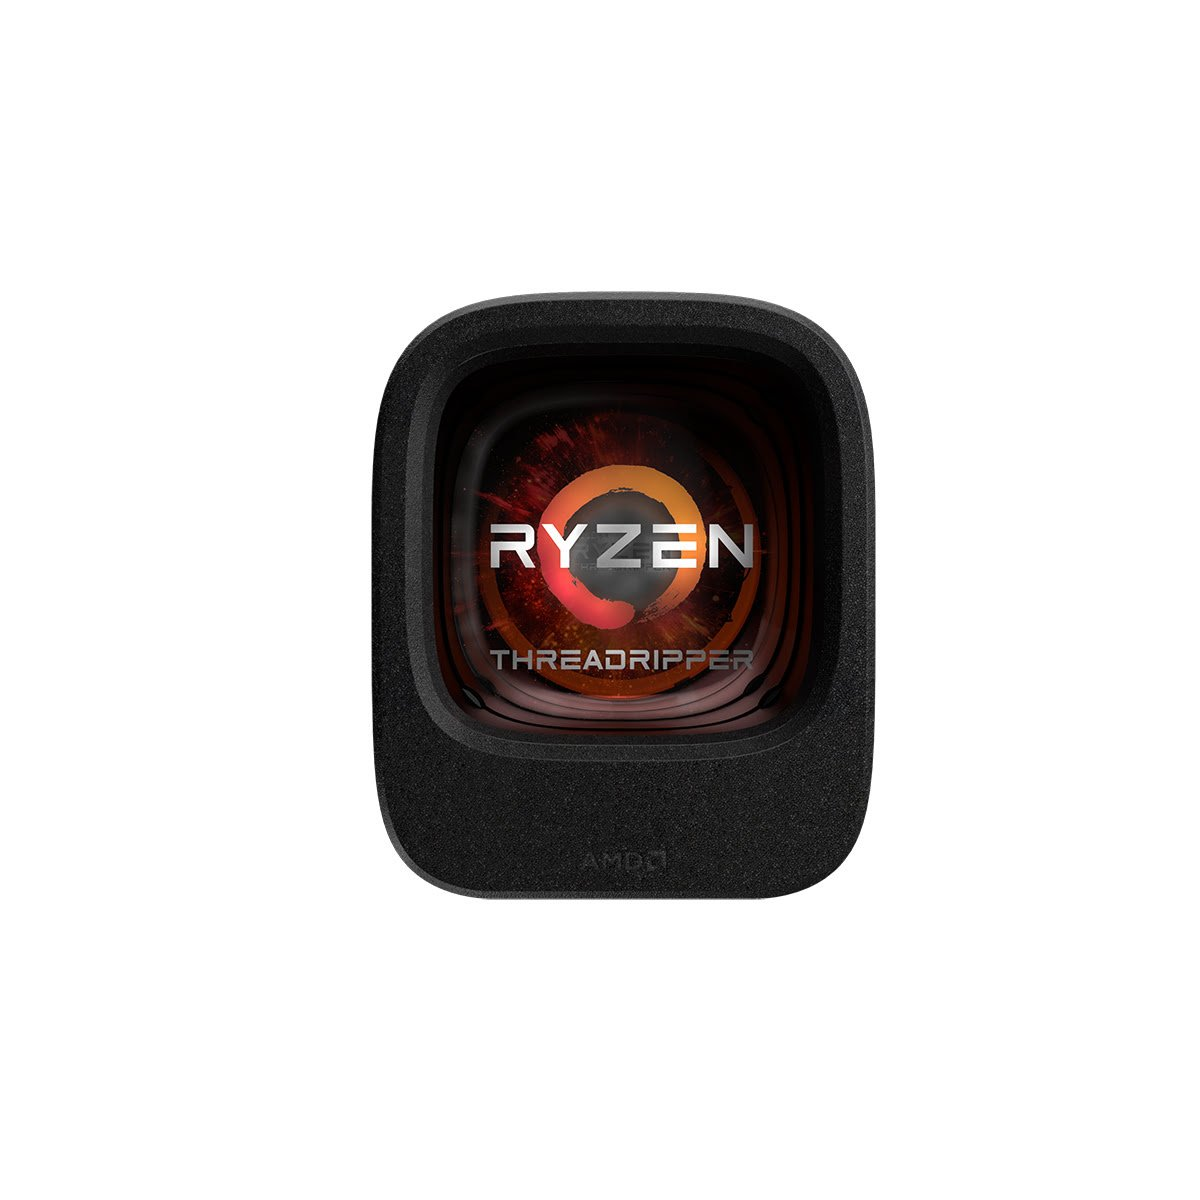 AMD Ryzen Threadripper 1950X - 3.4 - 4GHz - Processeur AMD - 1